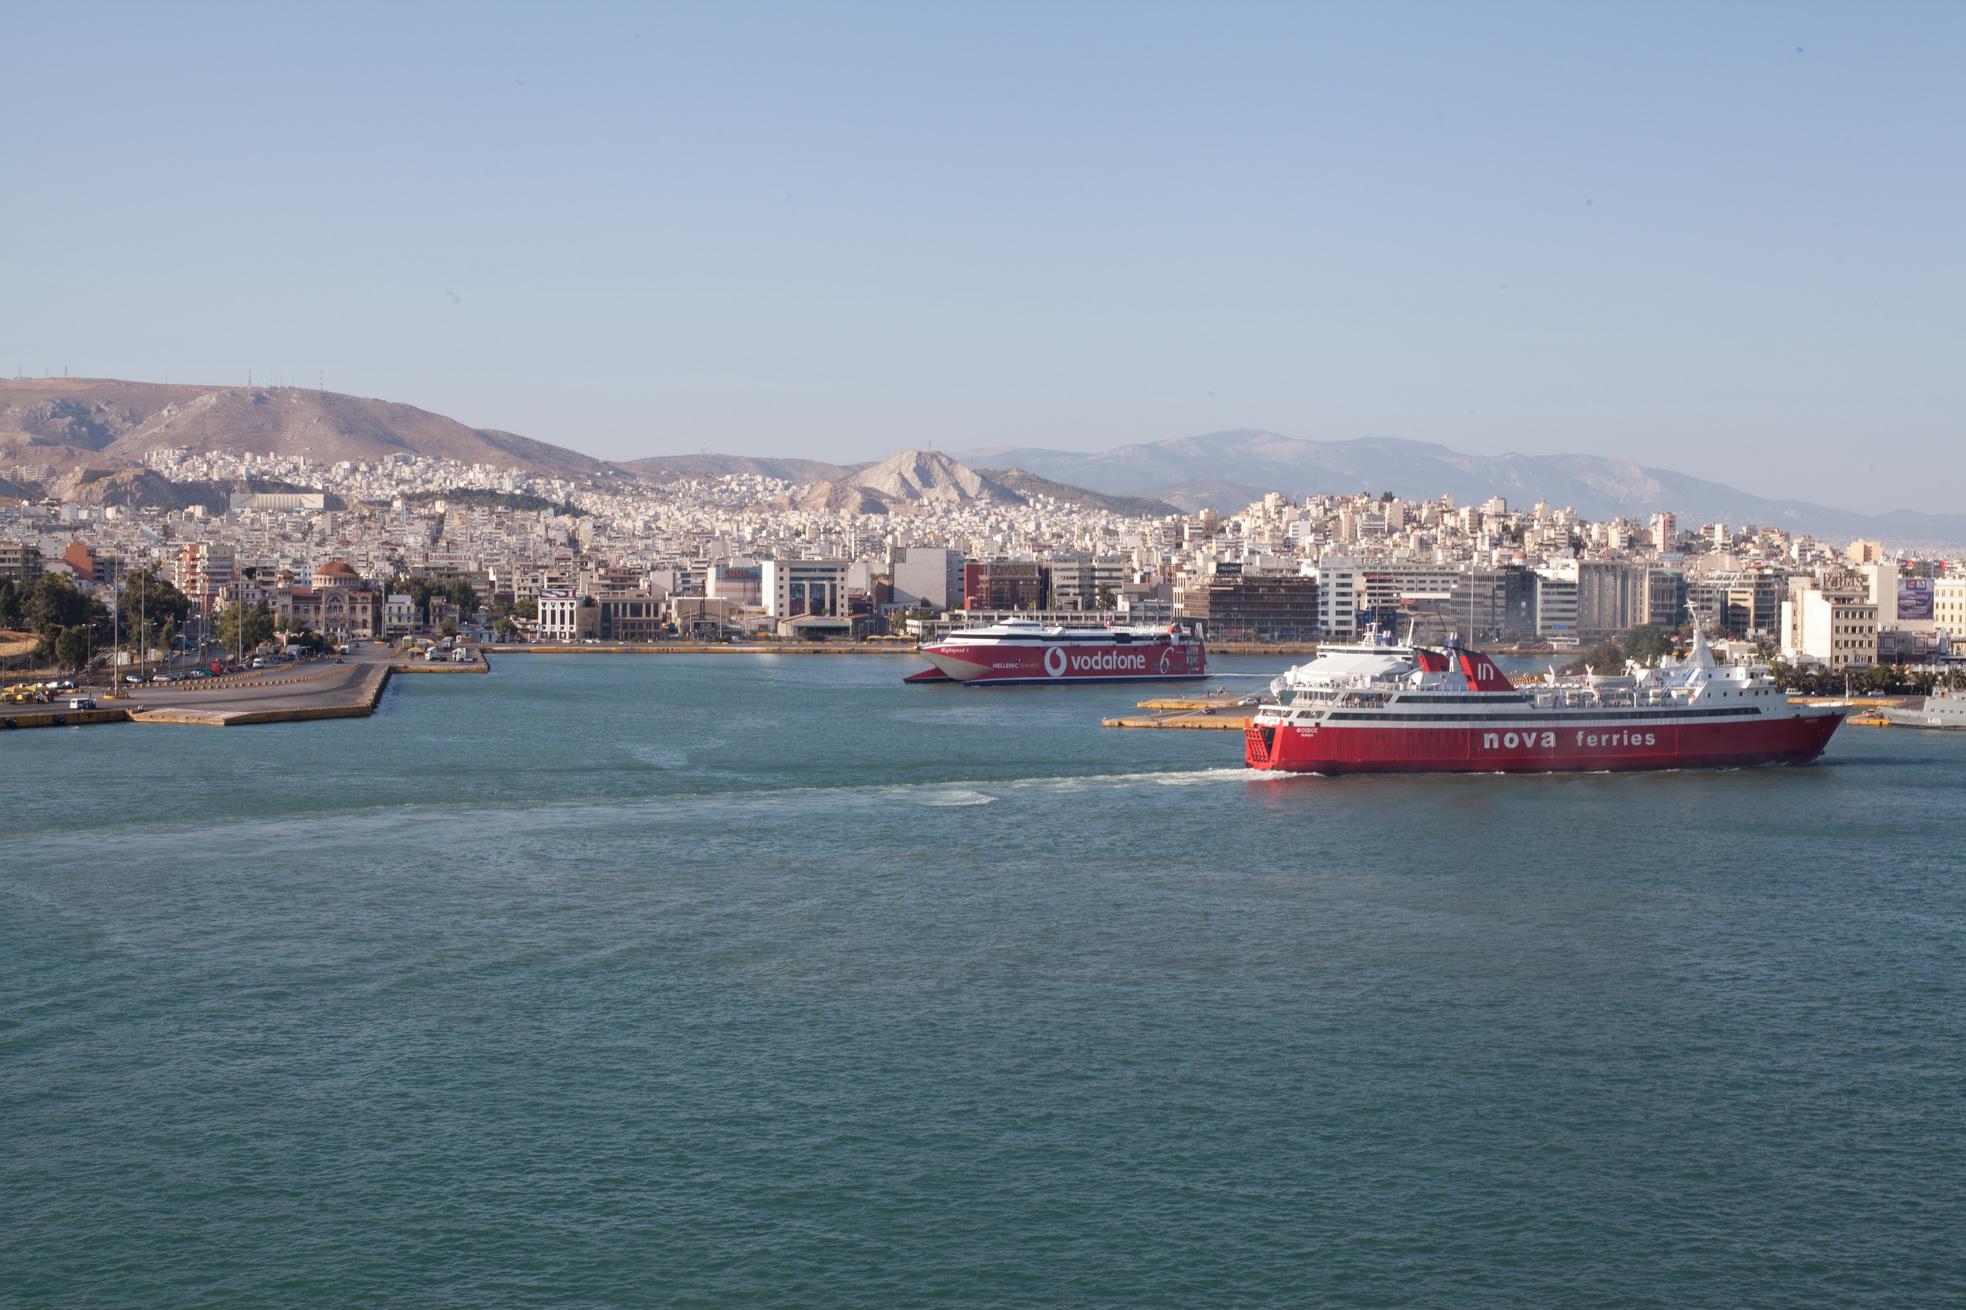 MS Phivos IMO 7825978 Nova Ferries entering Piraeus Port of Athens Greece 01